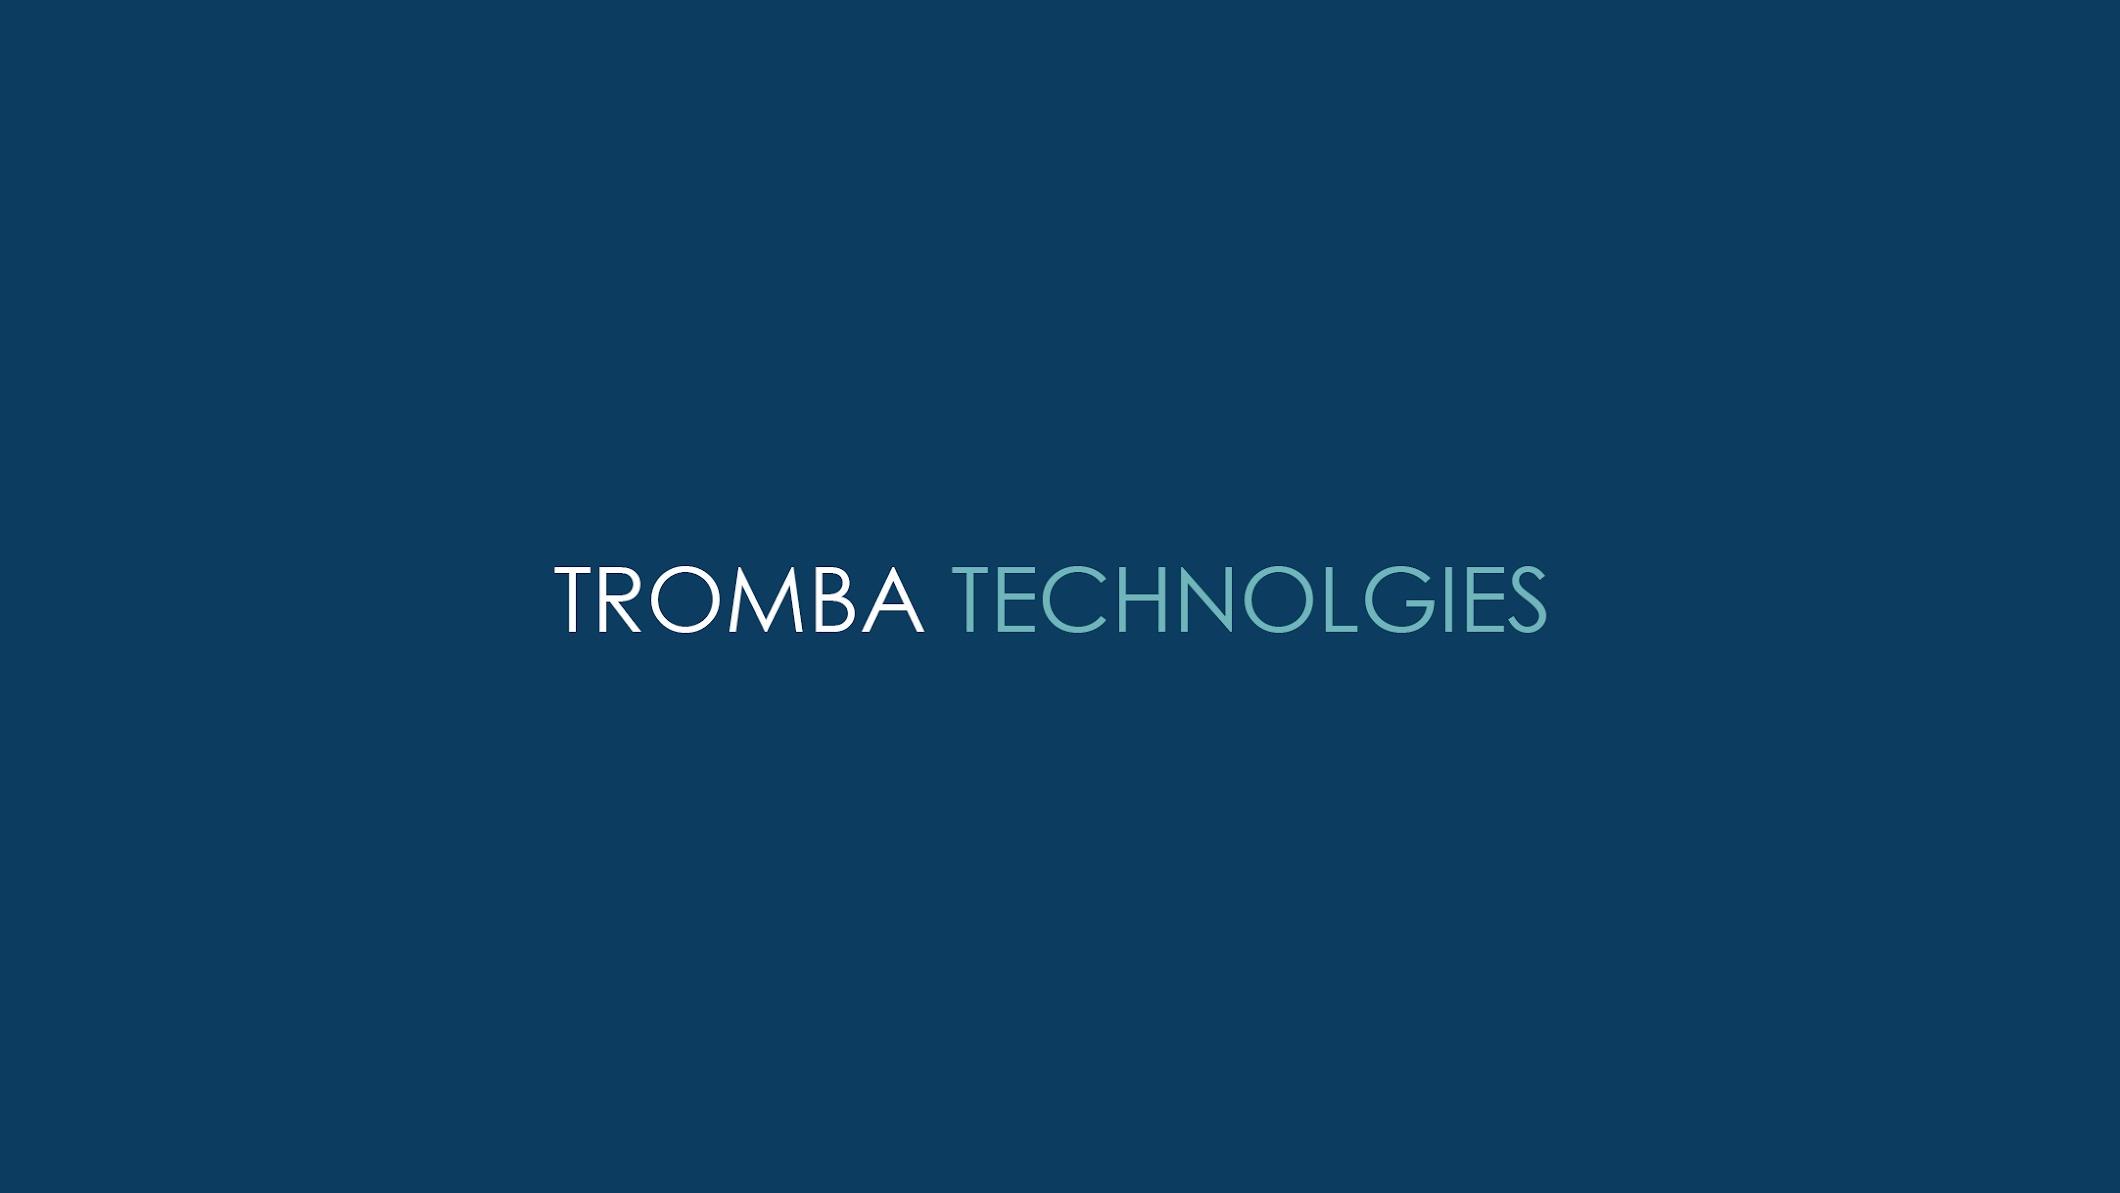 Tromba Technologies